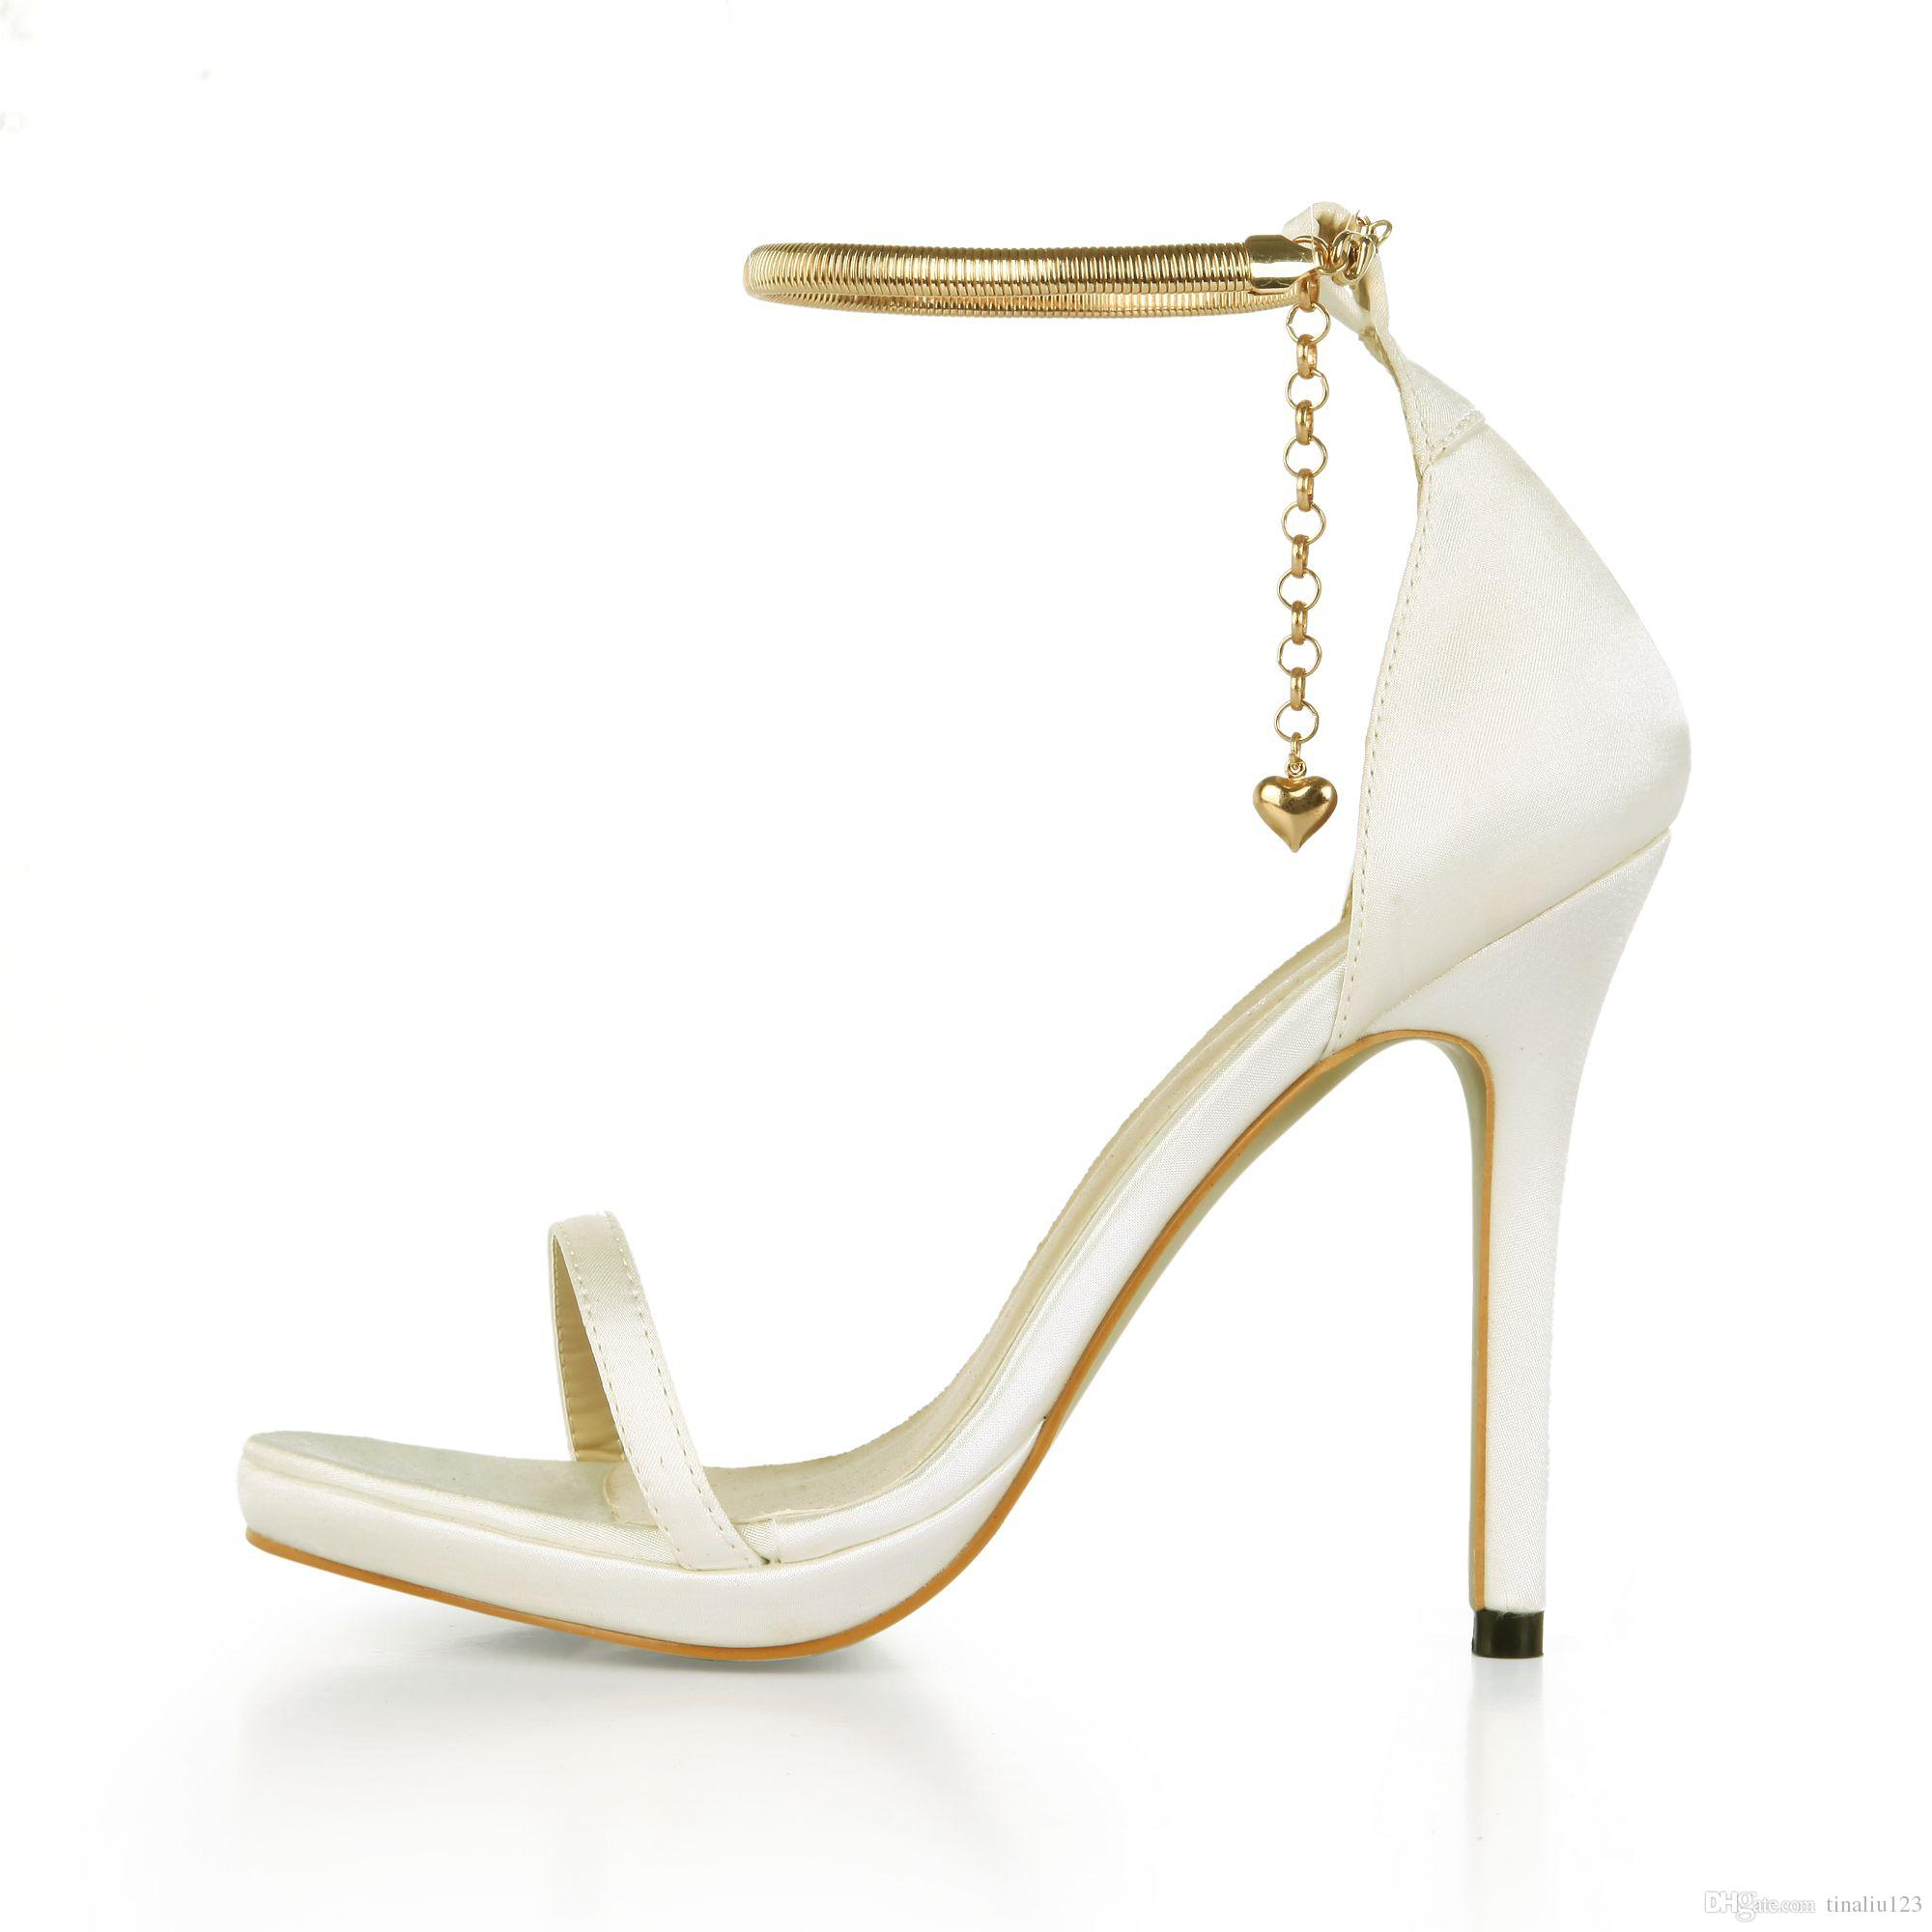 a5fd5eb88015 2017 New Arrival Summer Luxury Women Shoe Fashion Gold Chain High ...